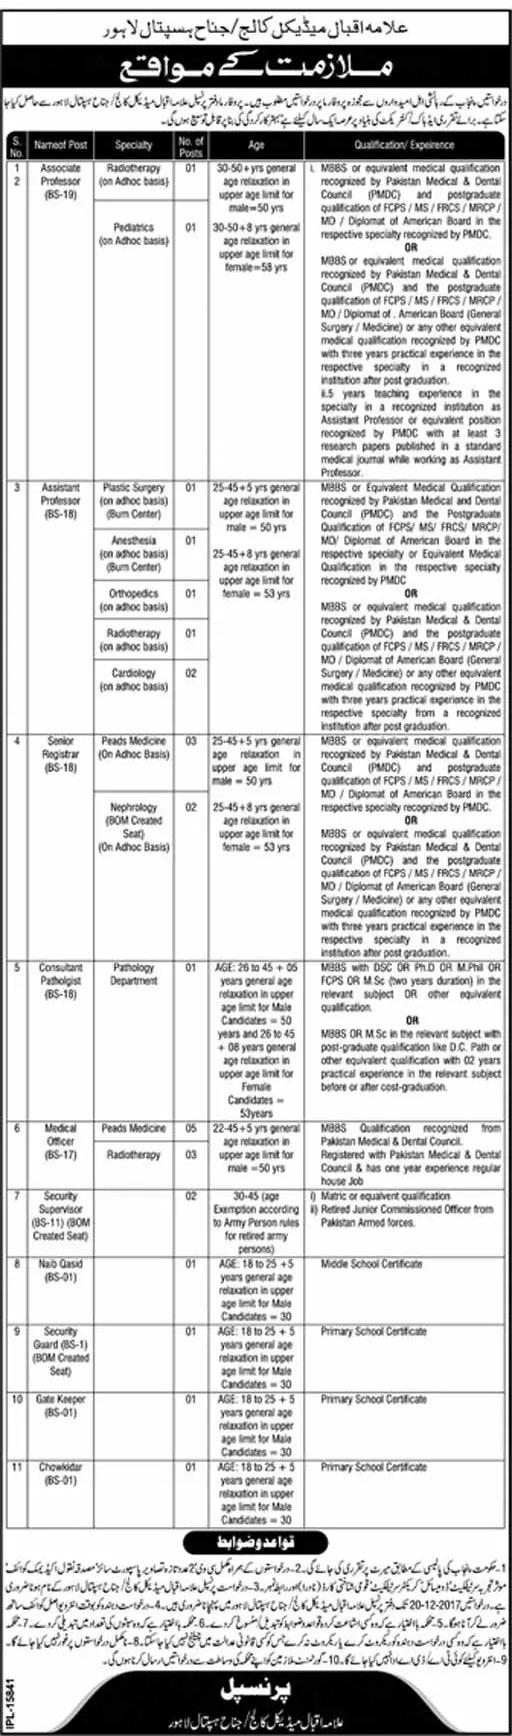 Allama Iqbal Medical College Lahore Jobs 2017 Professor, Medical officer Jinnah Hospital Government Vacancies